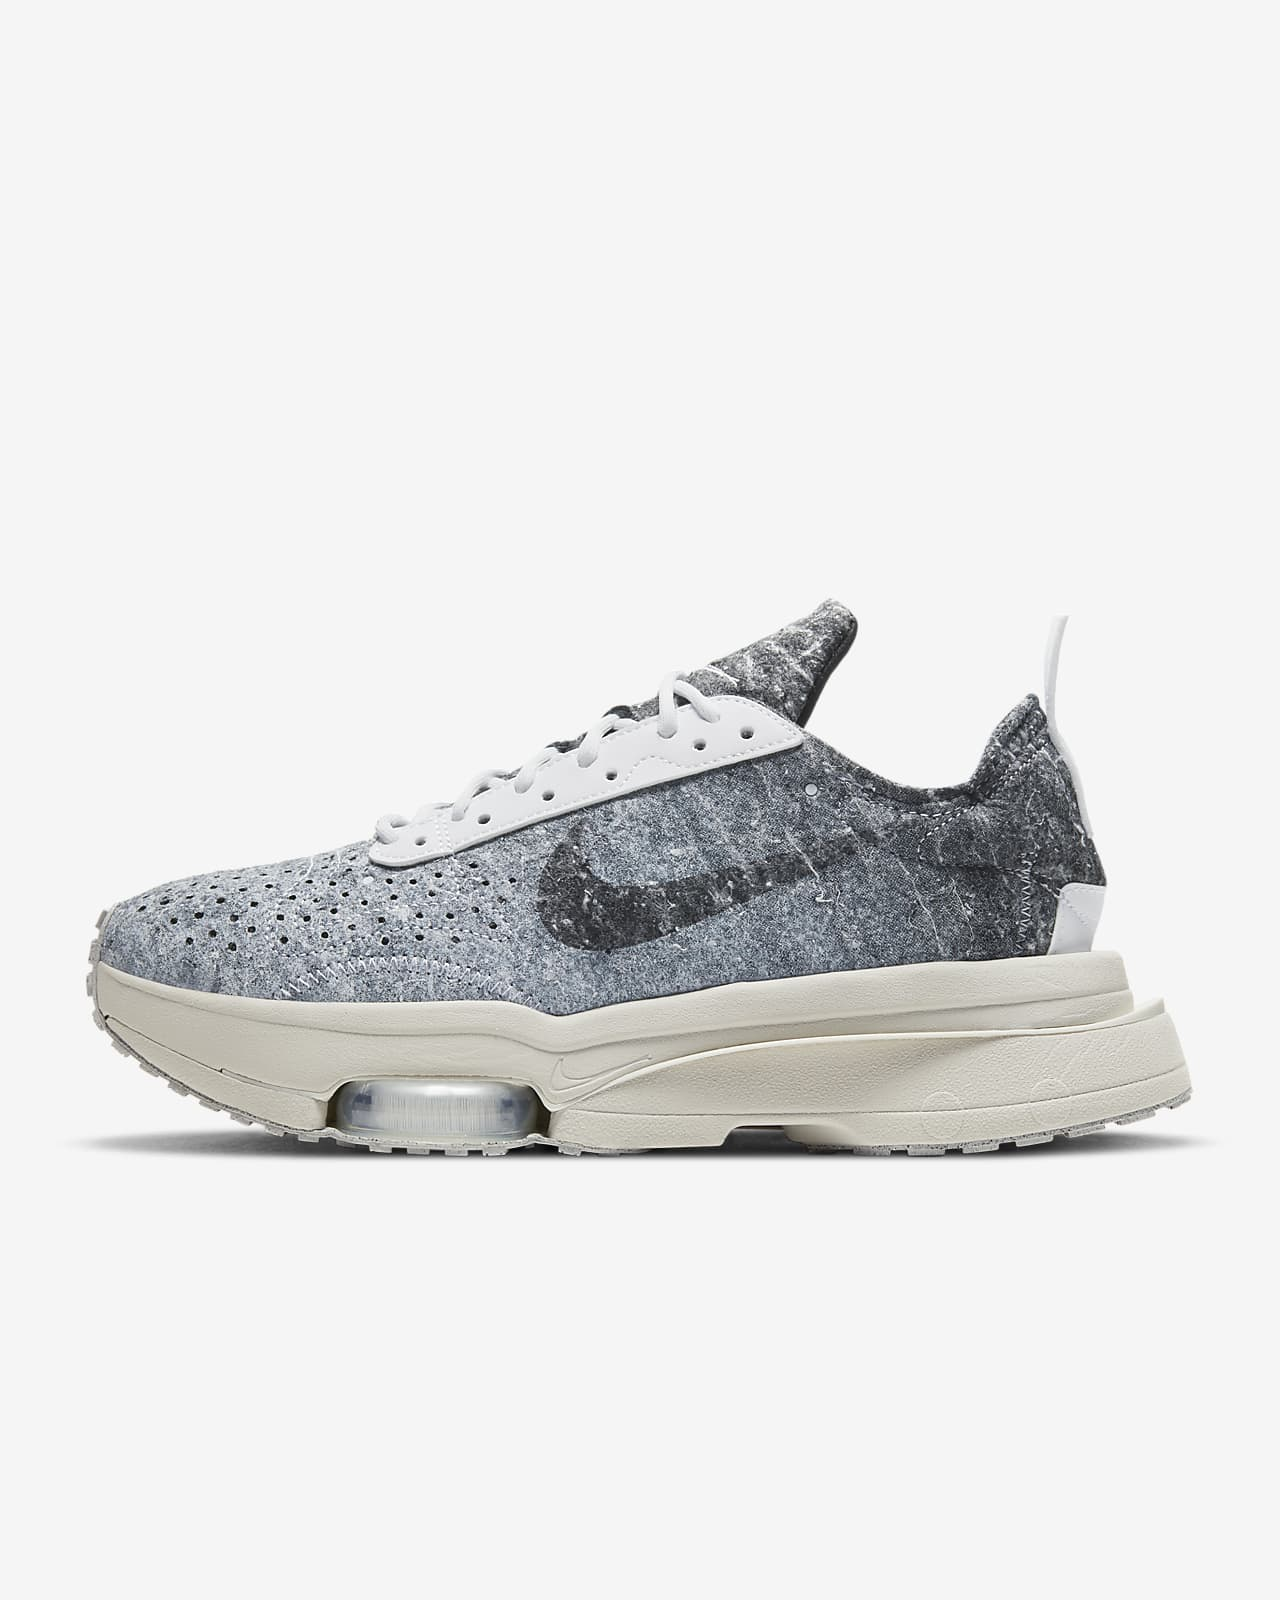 Nike Air Zoom-Type SE Women's Shoe